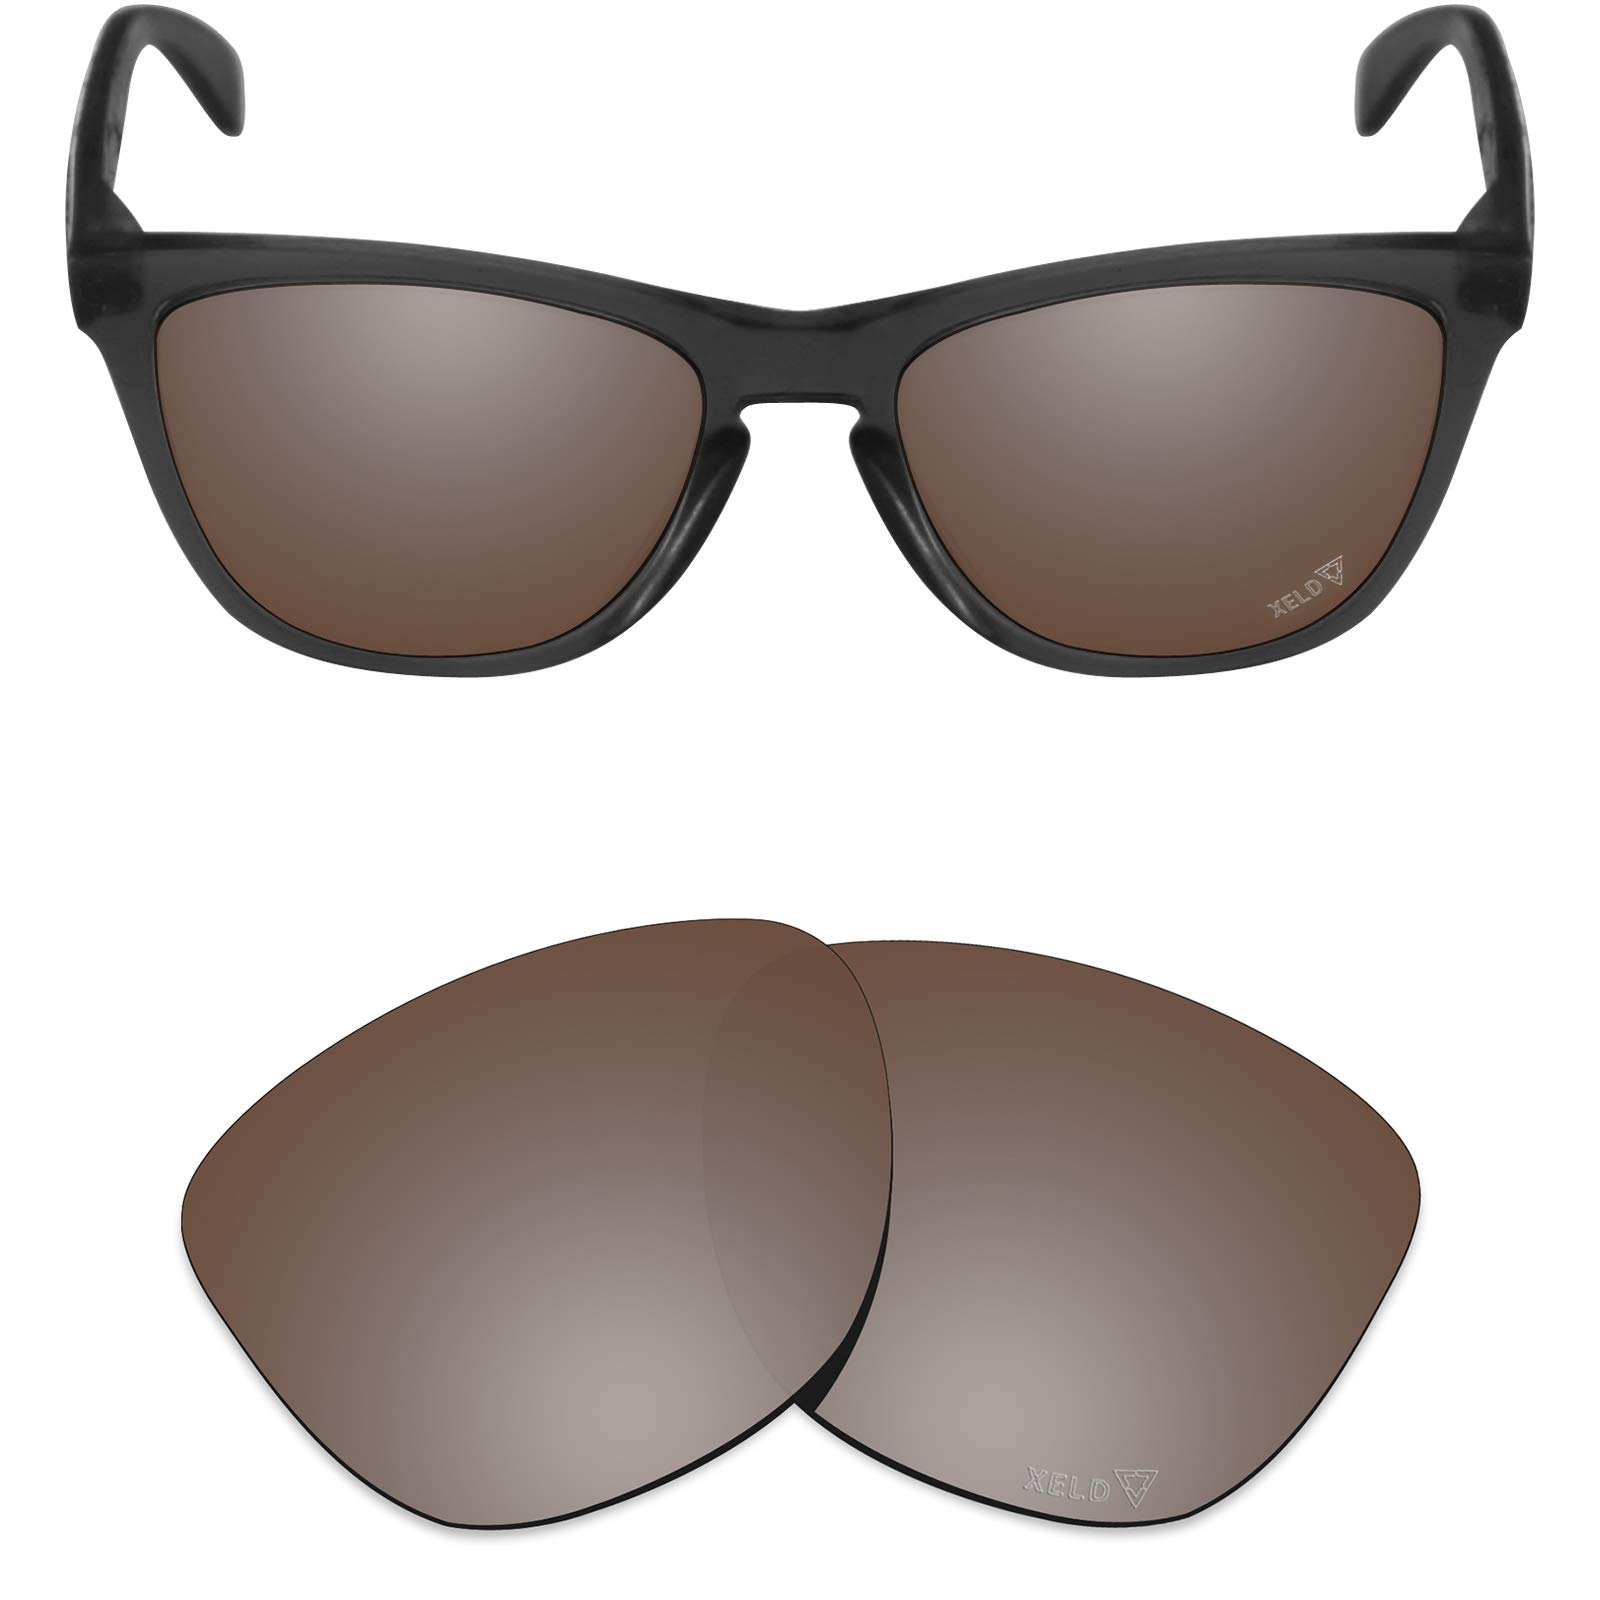 Mryok XELD Replacement Lenses for Oakley Frogskins - Vivid Bronze by Mryok